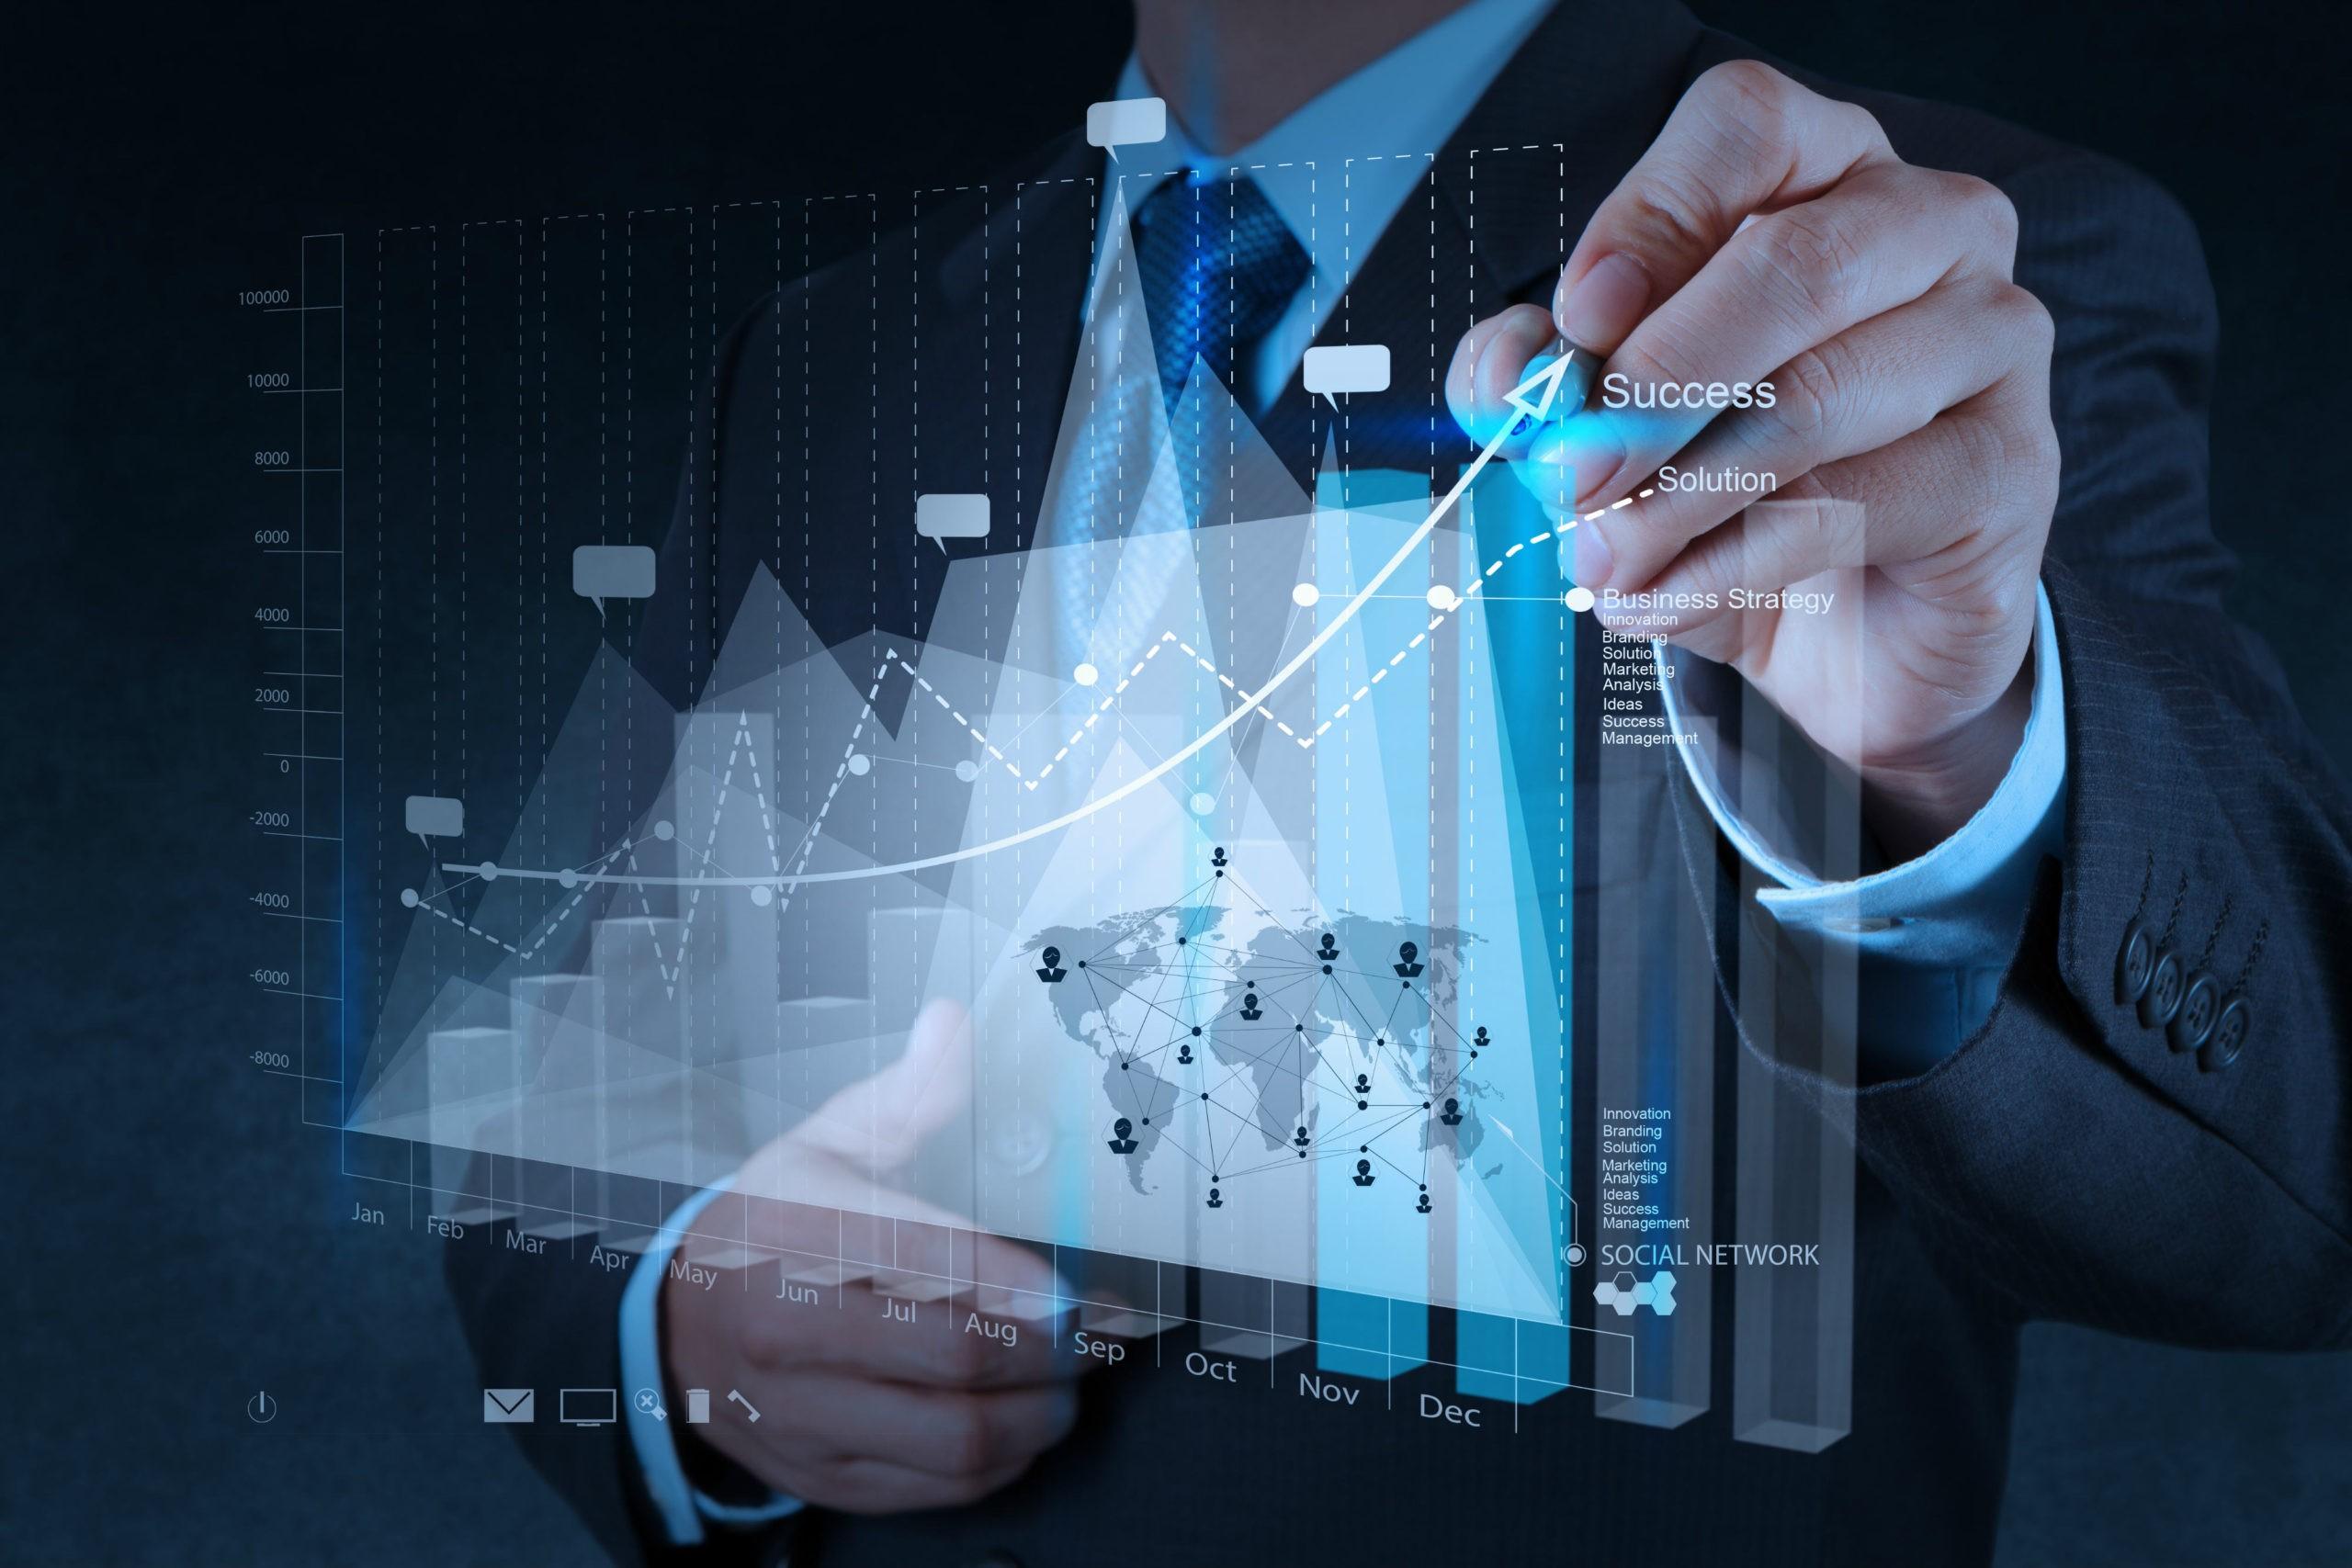 Инвестиции в бизнес — где и как можно найти инвестора